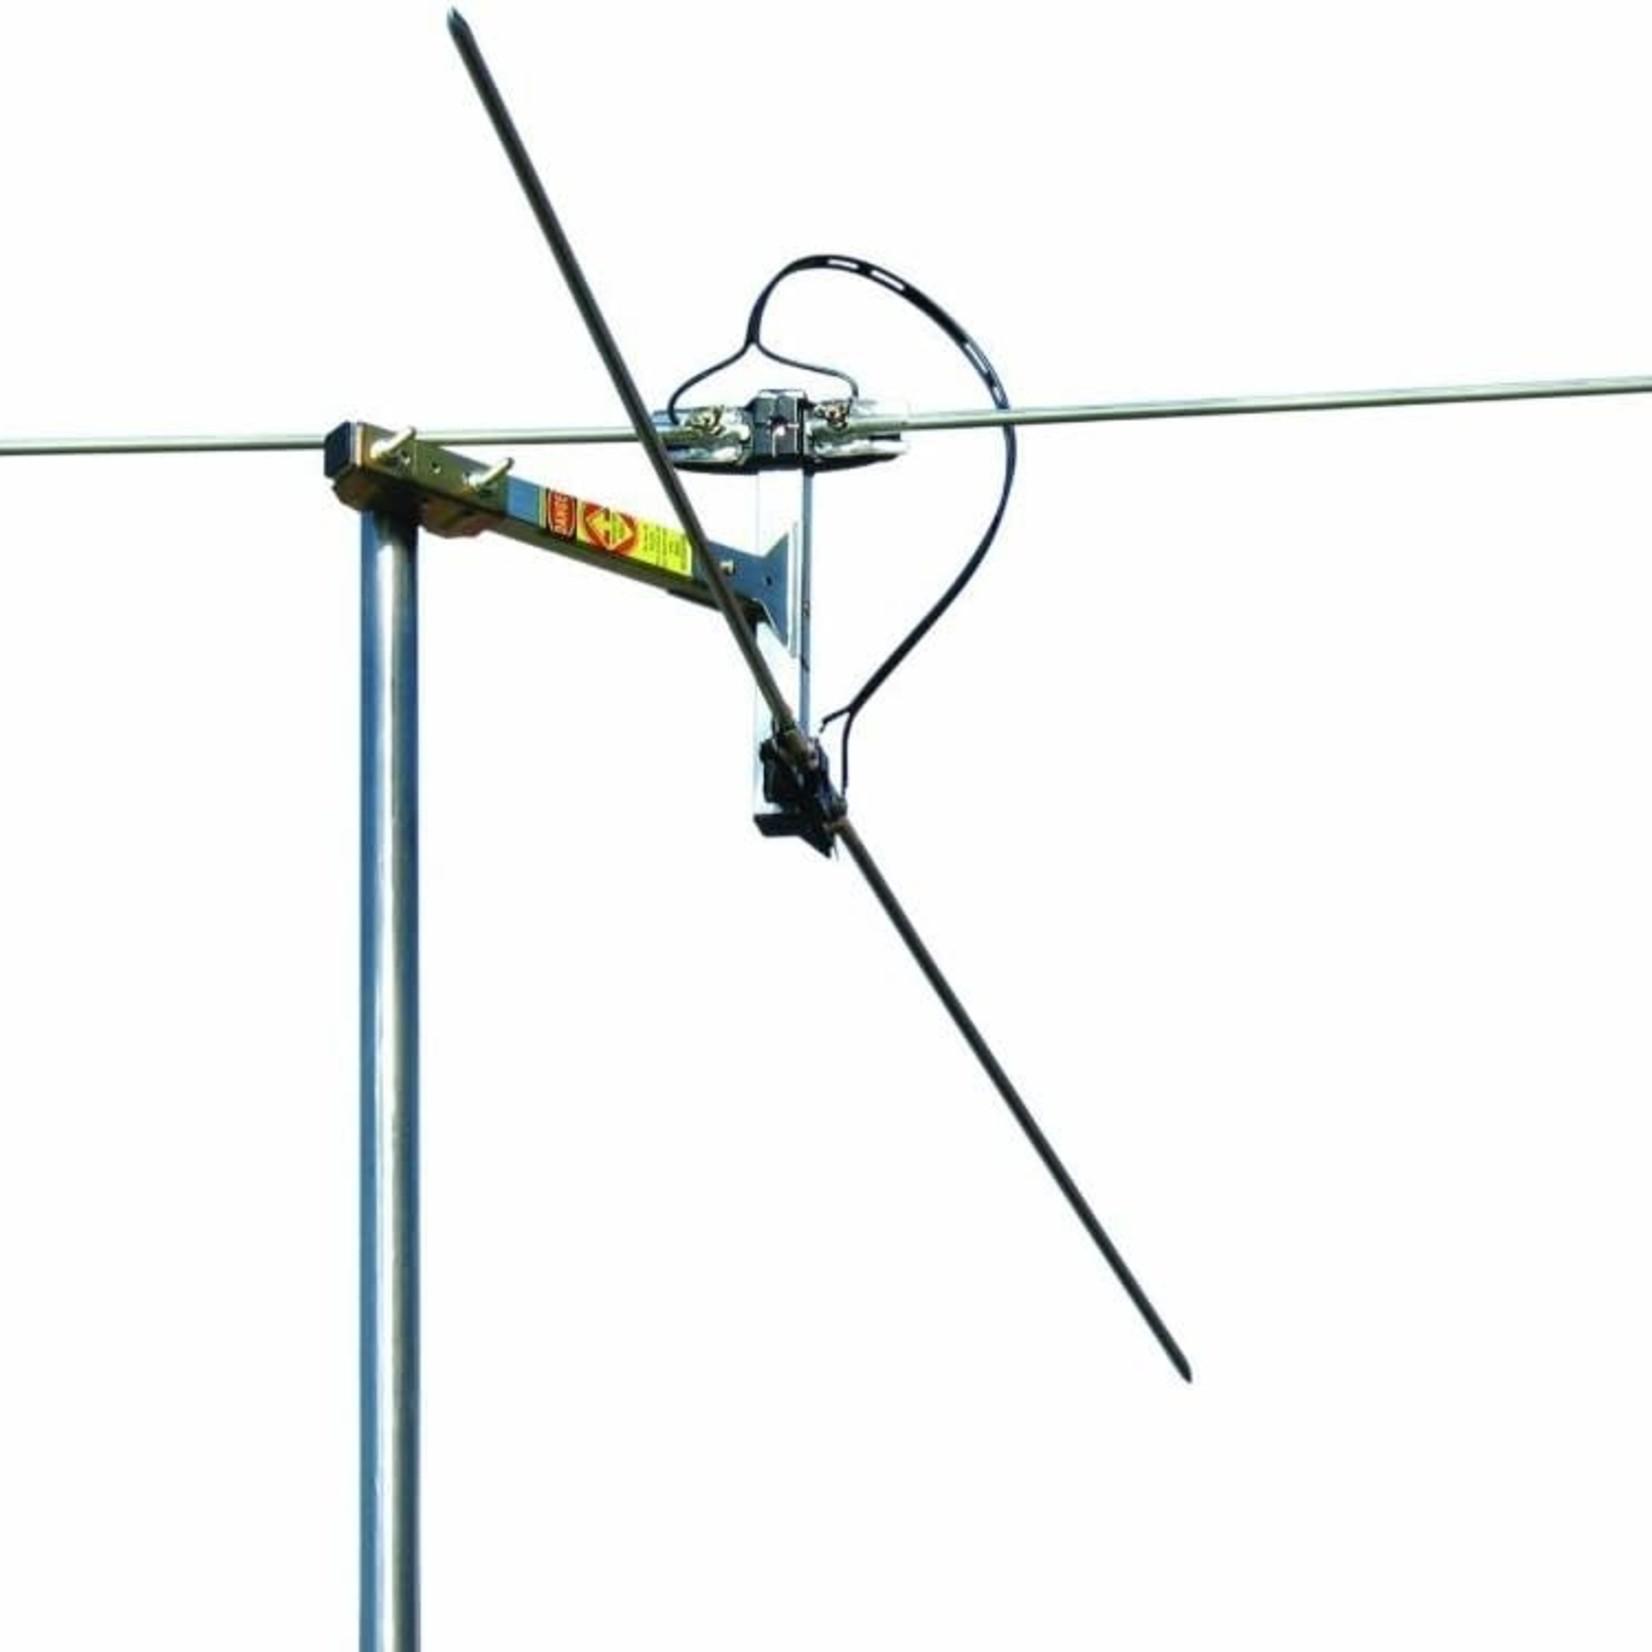 Winegard HD FM Radio Antenna HD-6010 *New, missing box